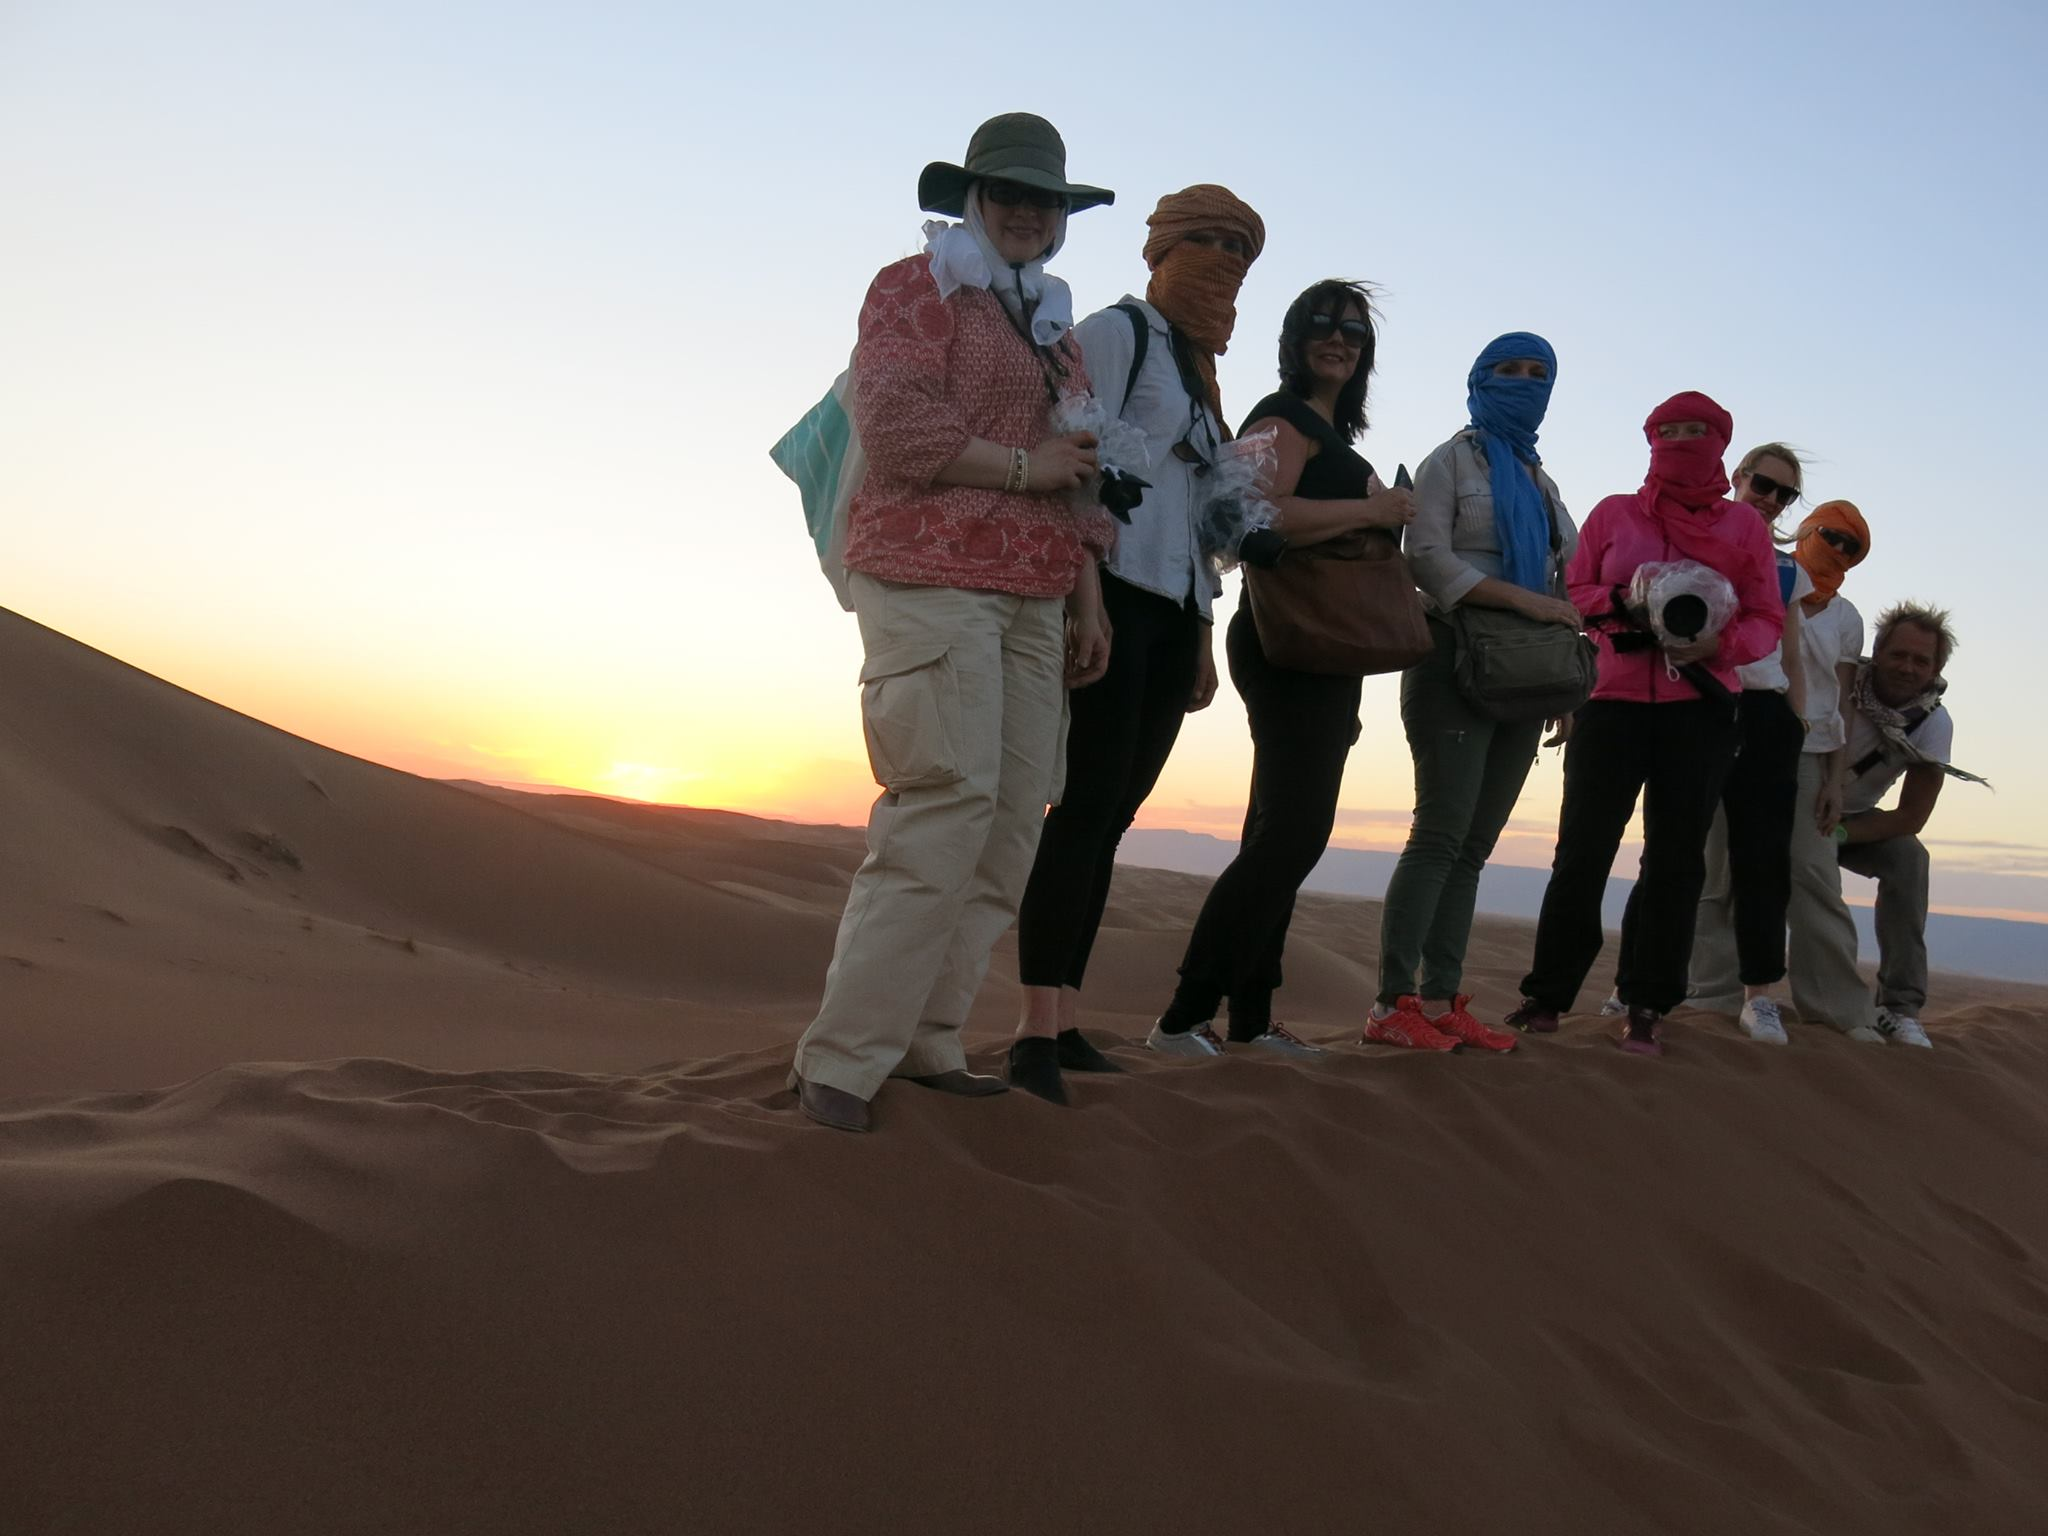 gruppbild sanddyn